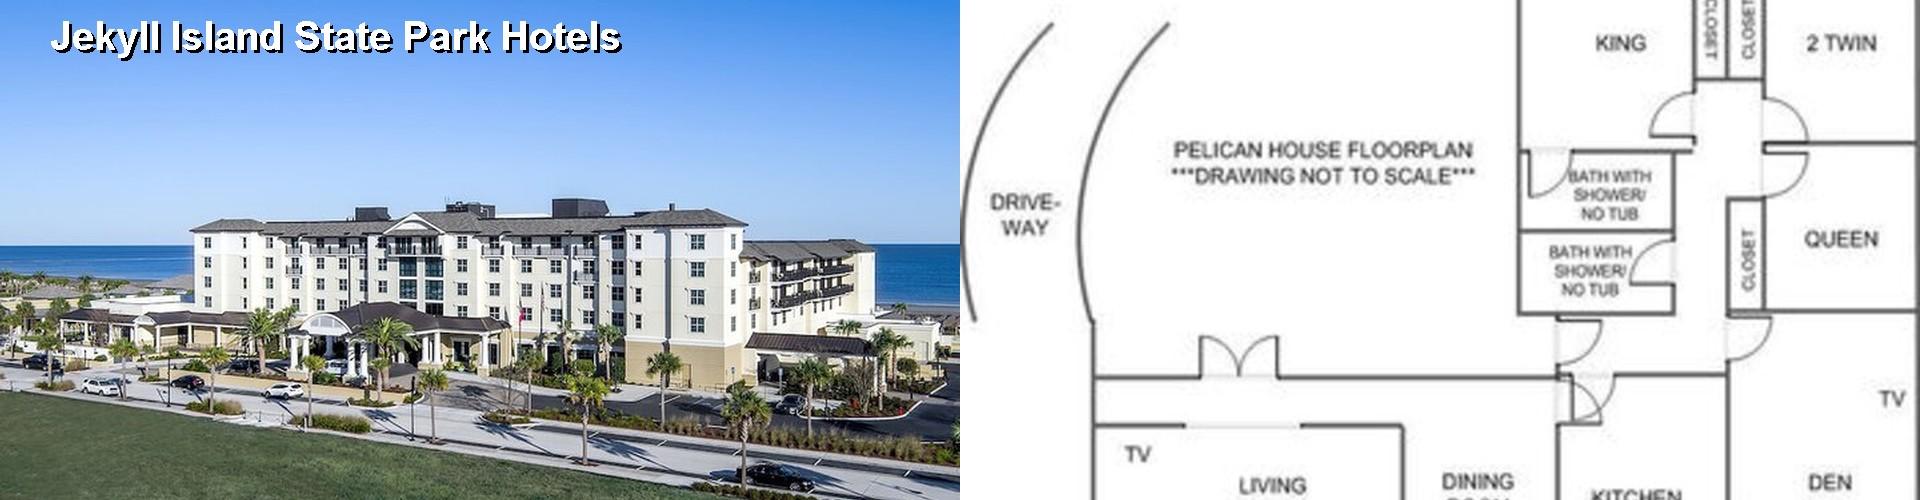 5 Best Hotels Near Jekyll Island State Park